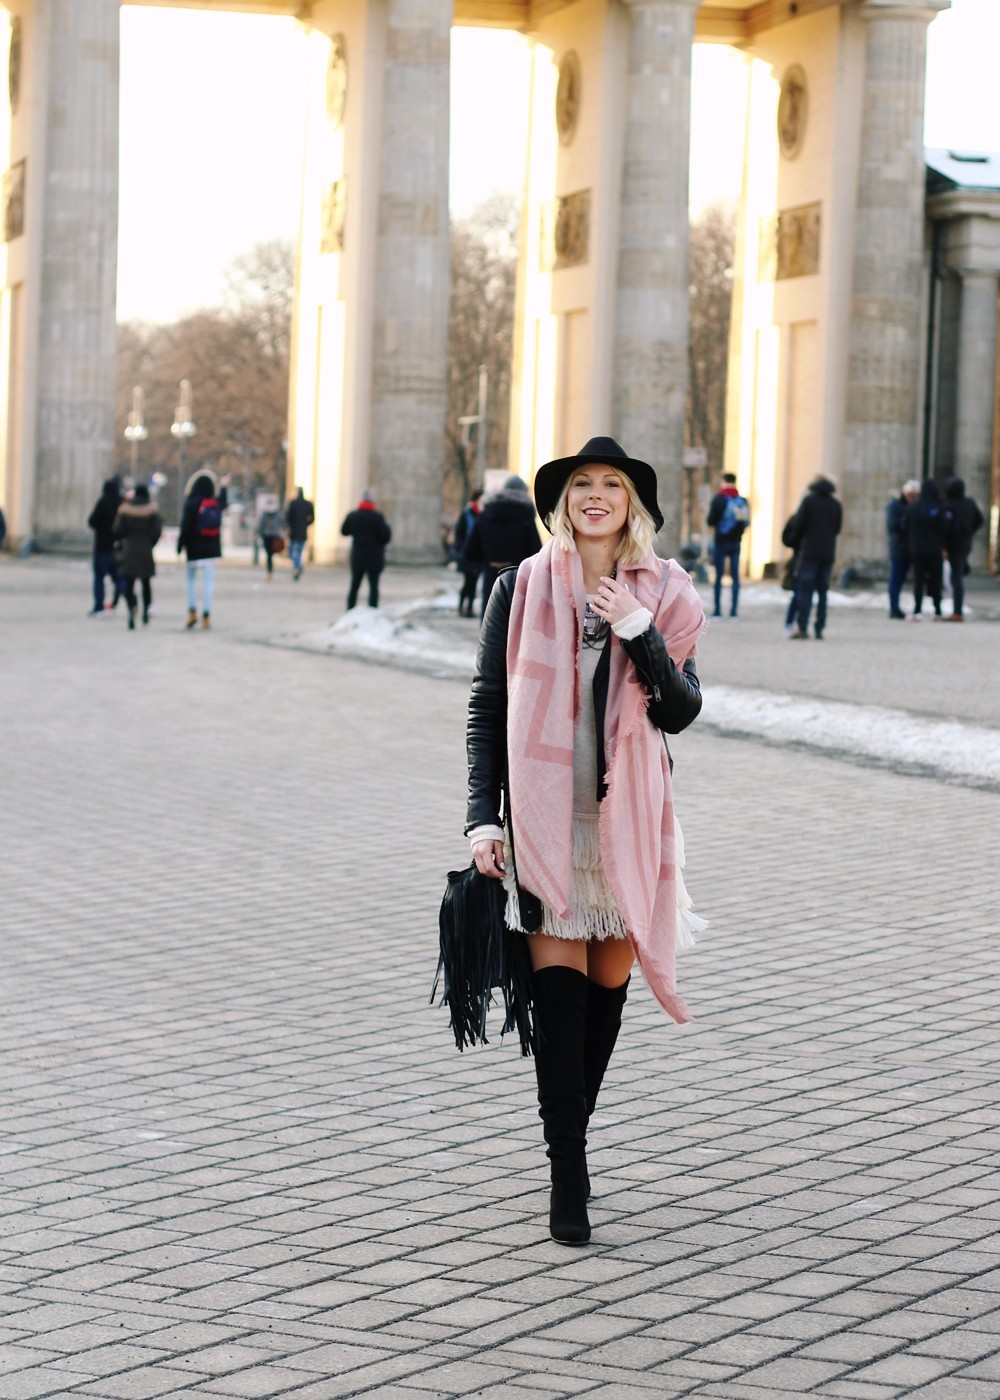 Fashion Week Berlin 2016 Outfit OOTD Fransen Strickkleid Lederjacke Overknees Schal Hut Fransentasche 1